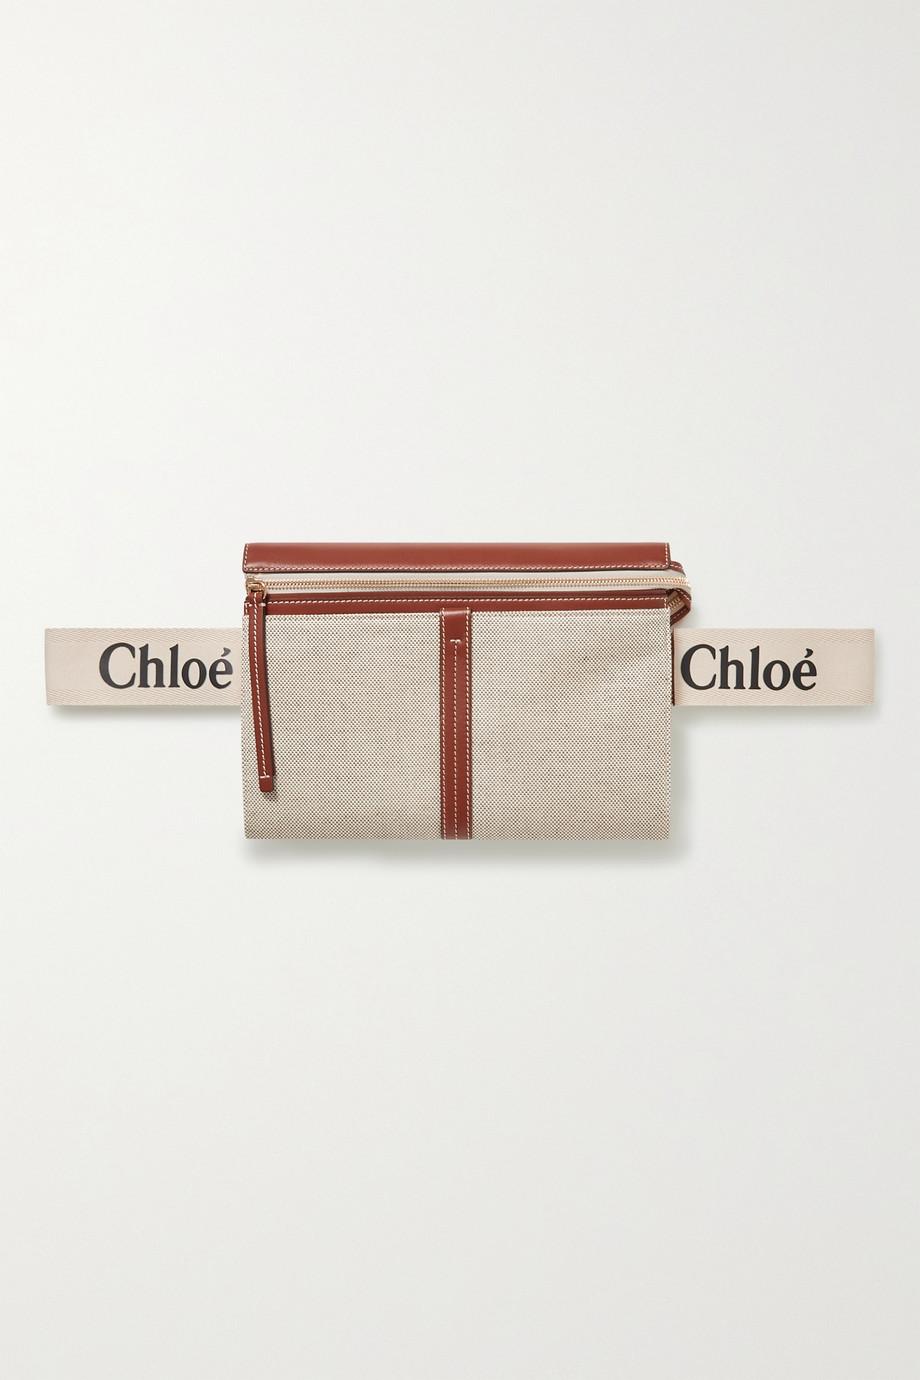 Chloé Woody leather-trimmed cotton-canvas shoulder bag